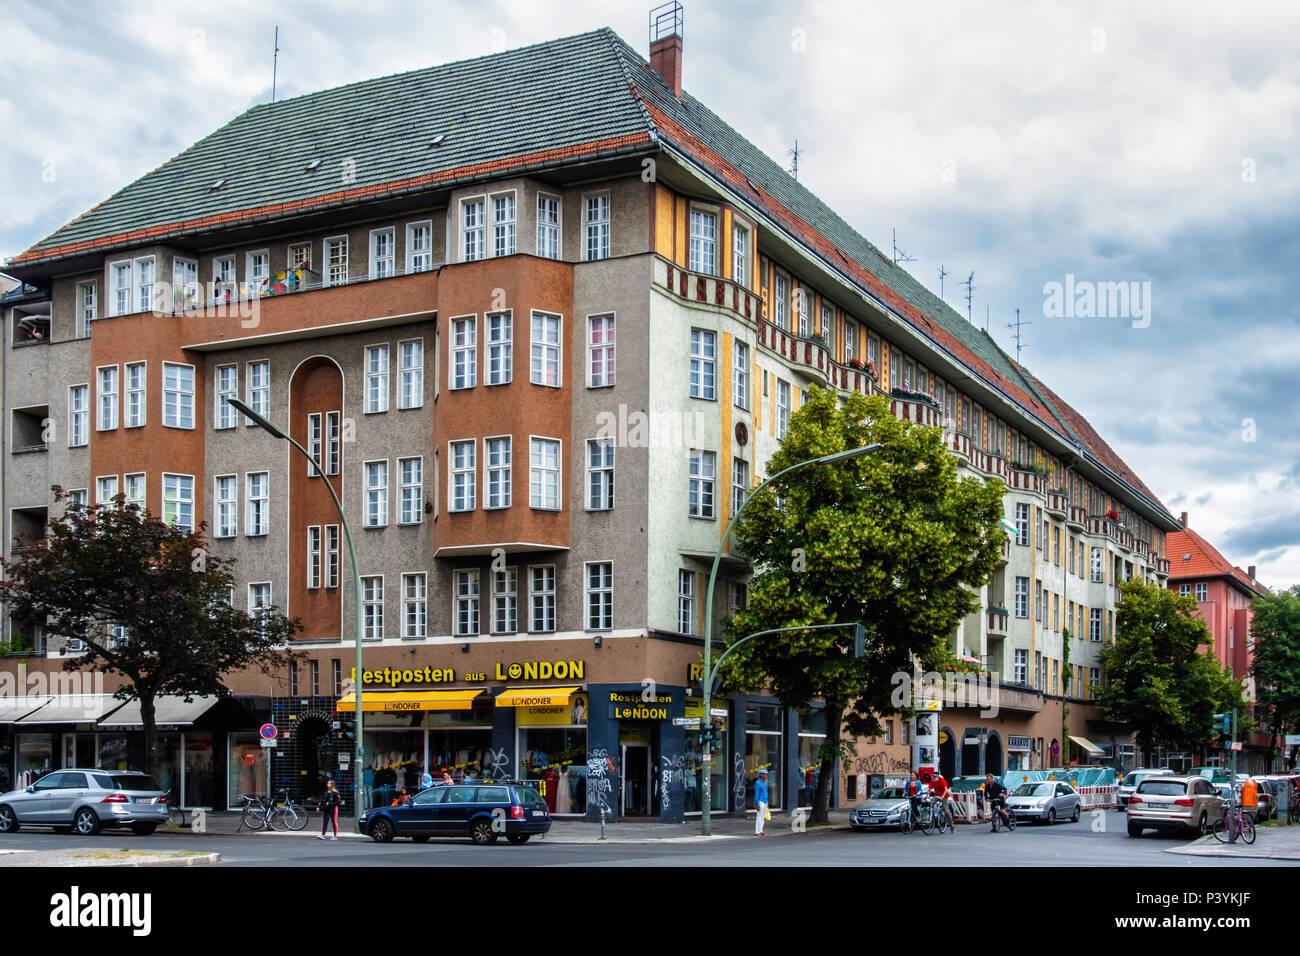 Berlin-Kreuzberg Kottbusser Damm street view. Historic listed old apartment building & Restposten aus London fashion shop - Stock Image